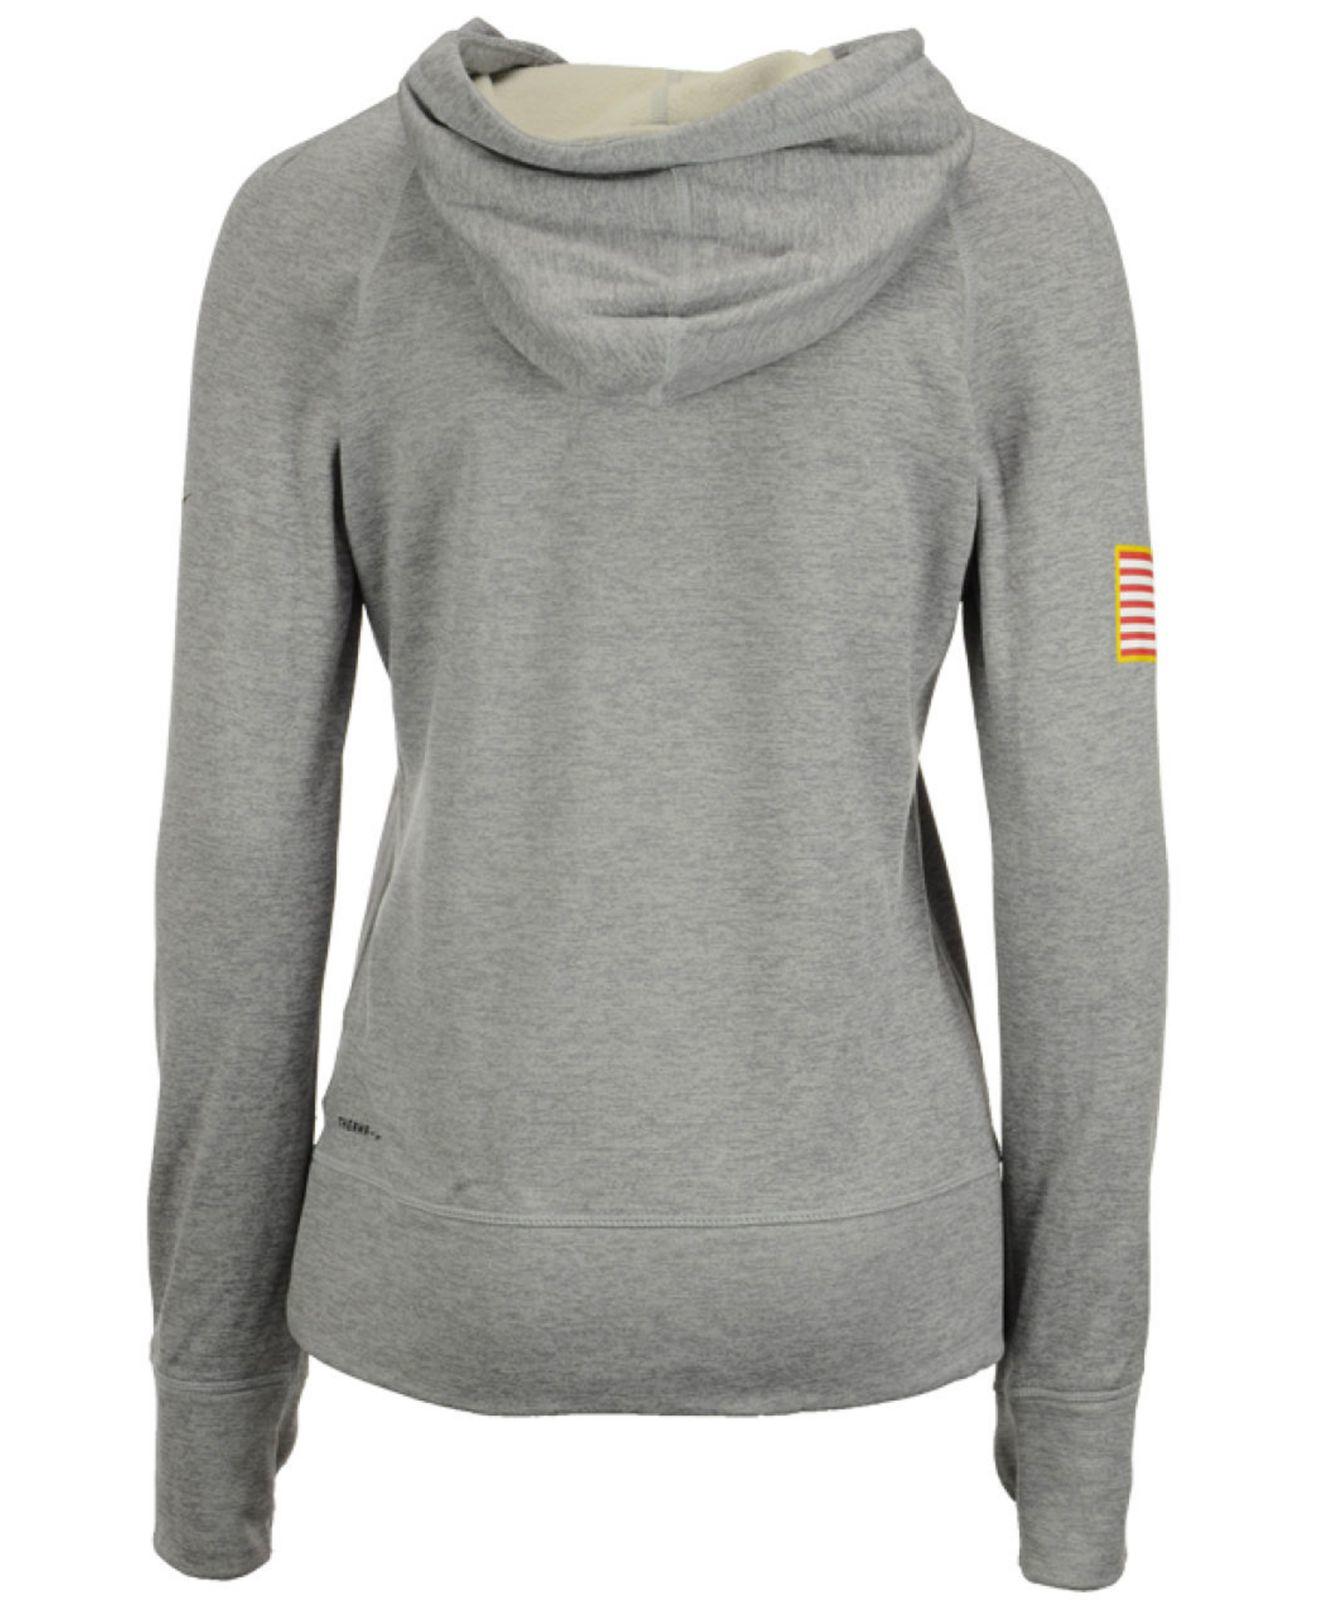 buy online c3908 4ae28 new england patriots women's crew sweatshirt | PT. Sadya Balawan